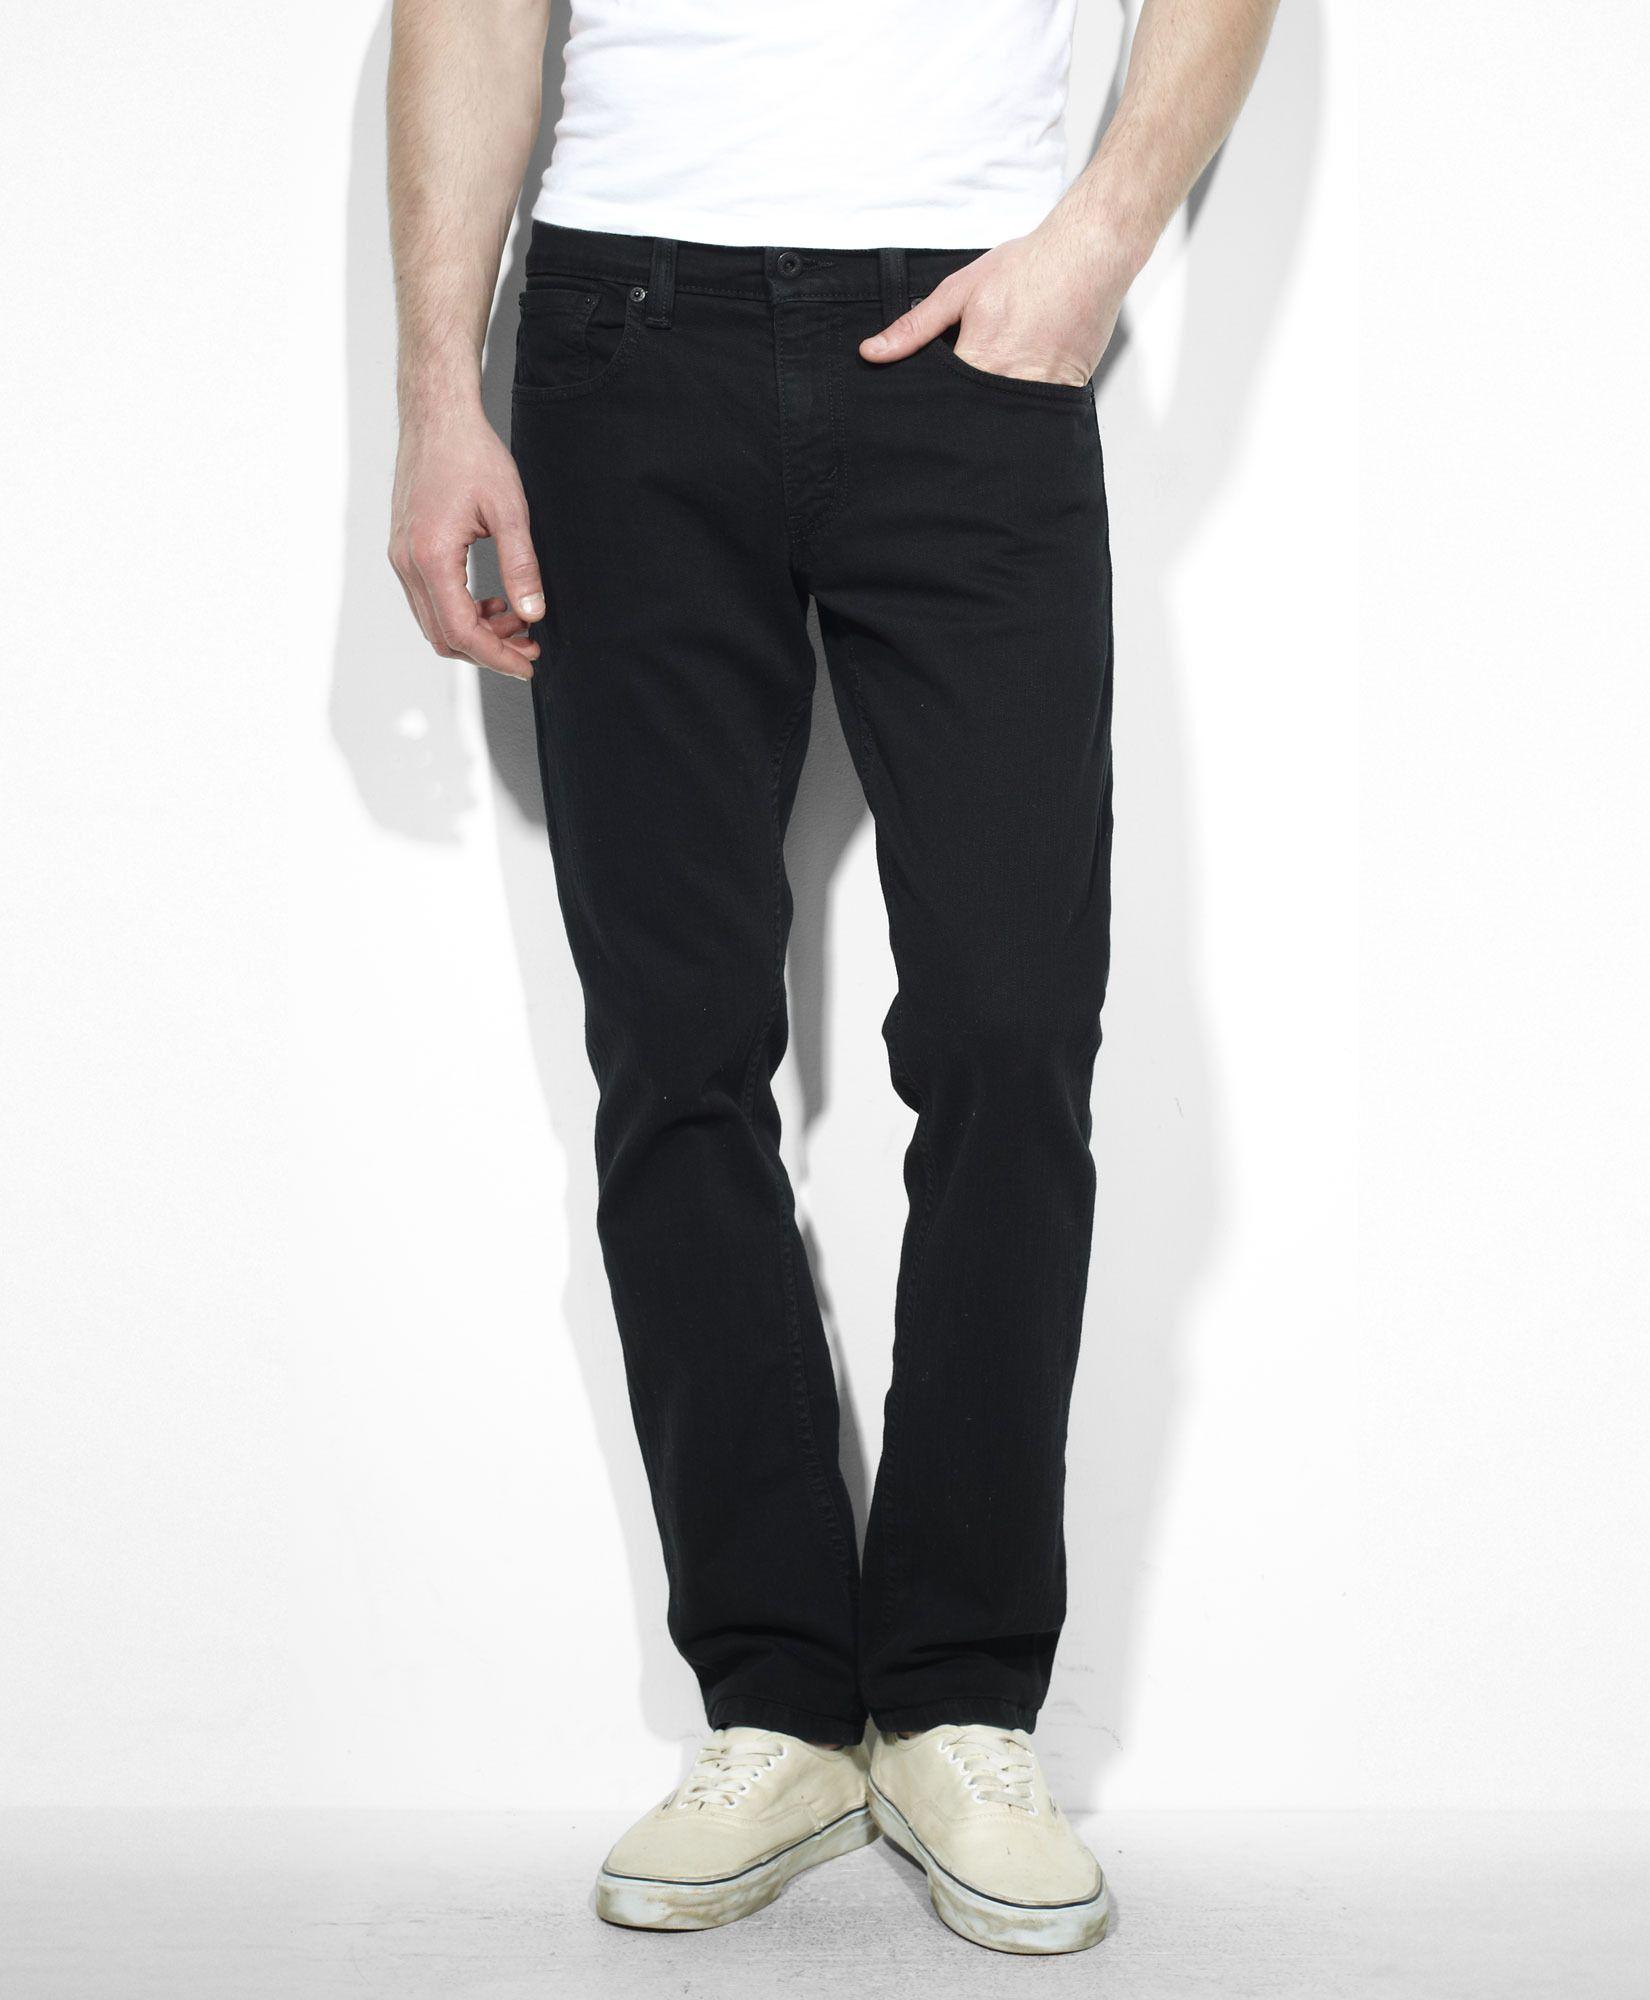 Levi's 511™ Slim Fit Jeans - Black Stretch - Jeans | material ...